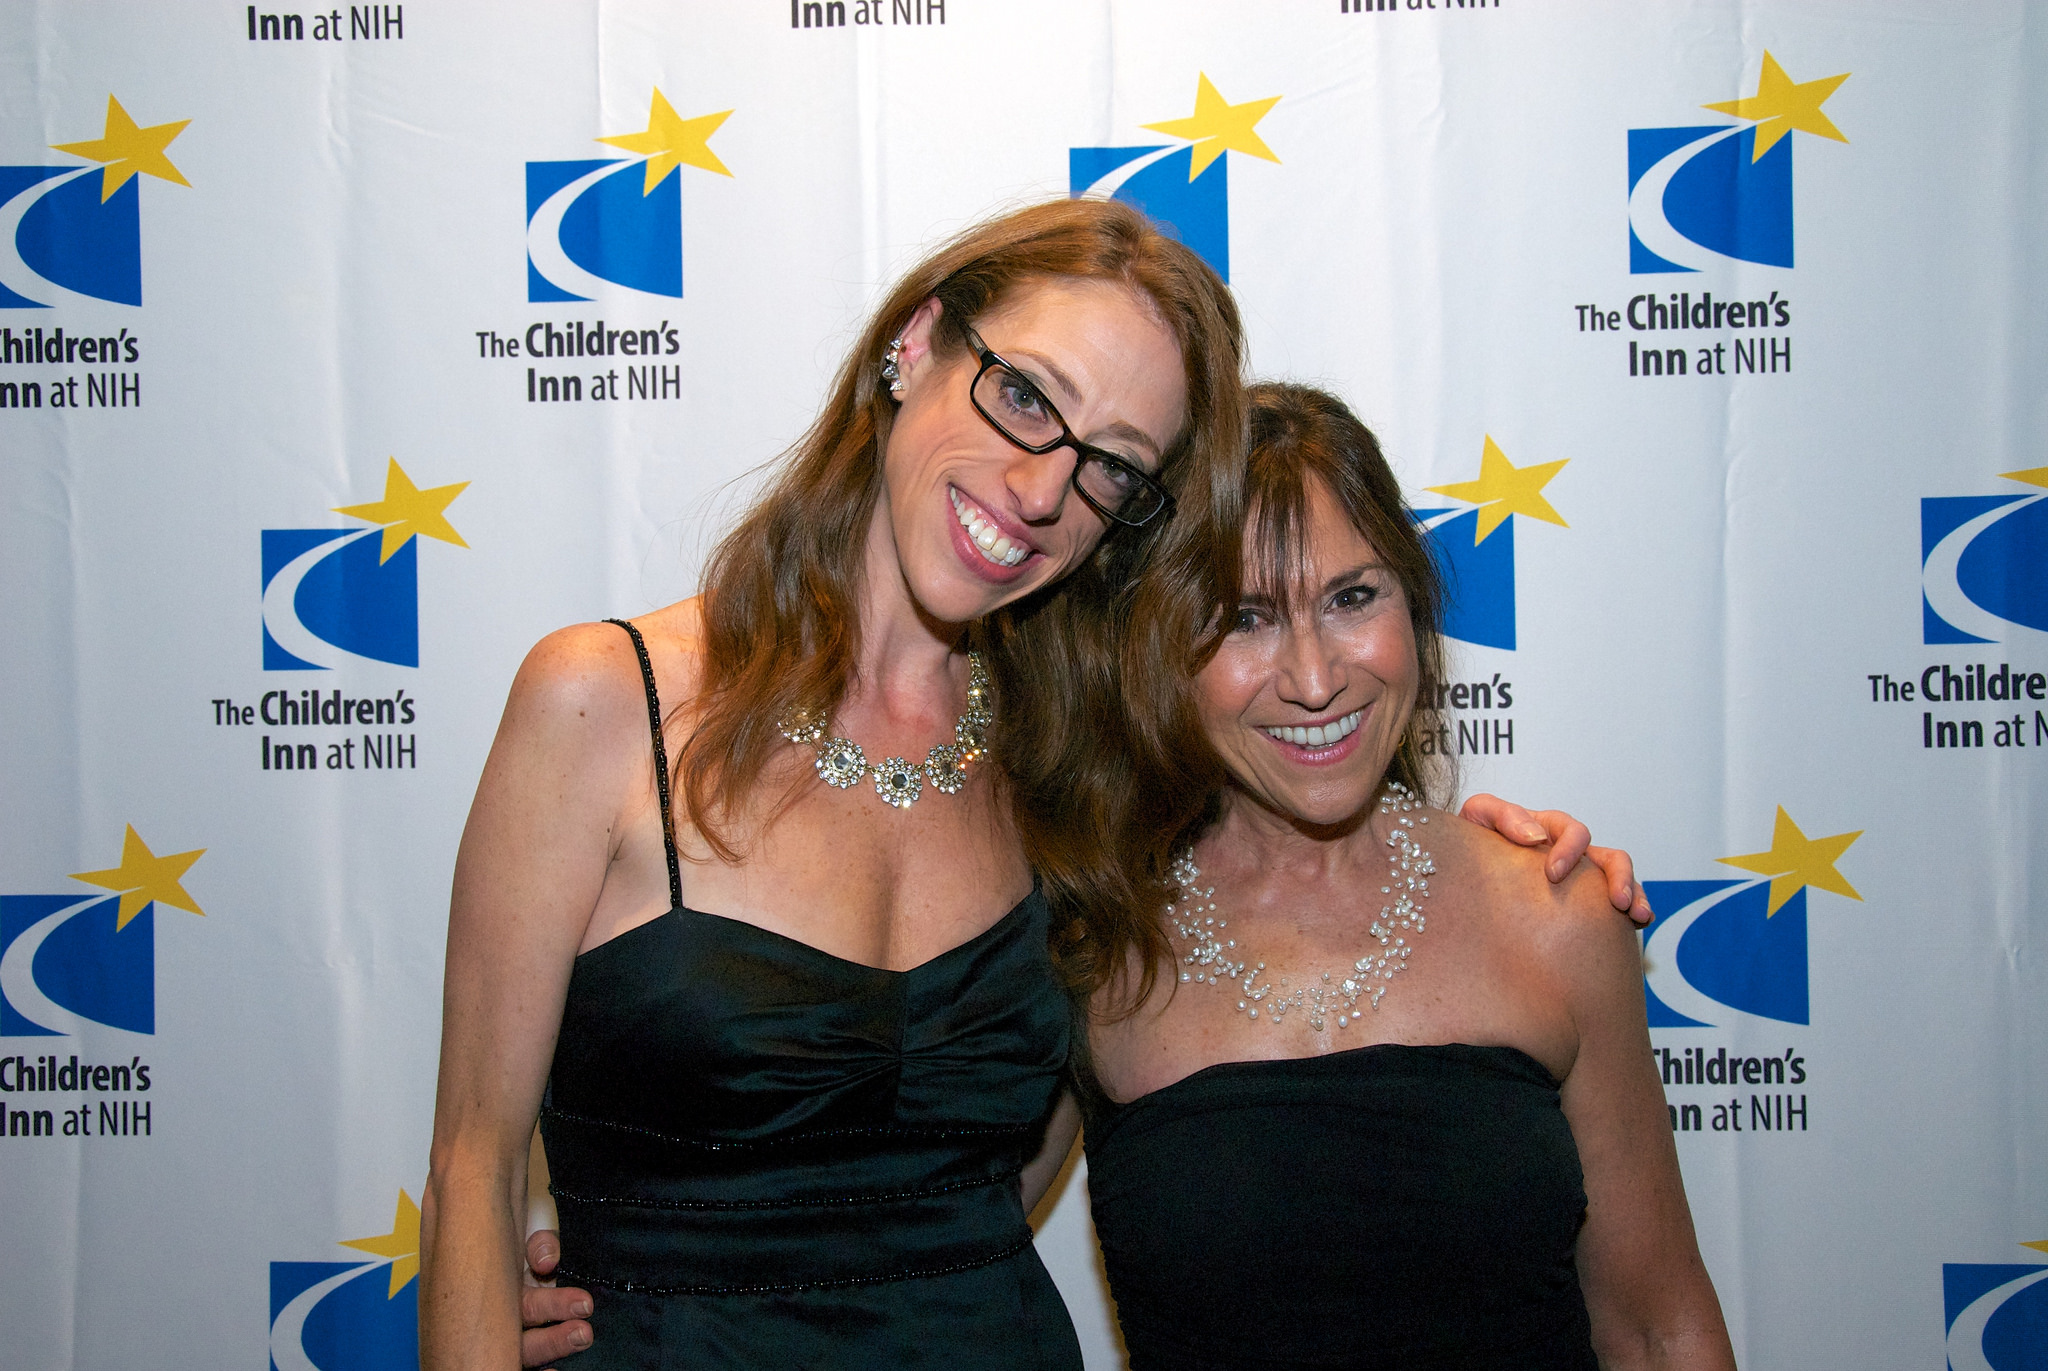 Lori Wiener at an event